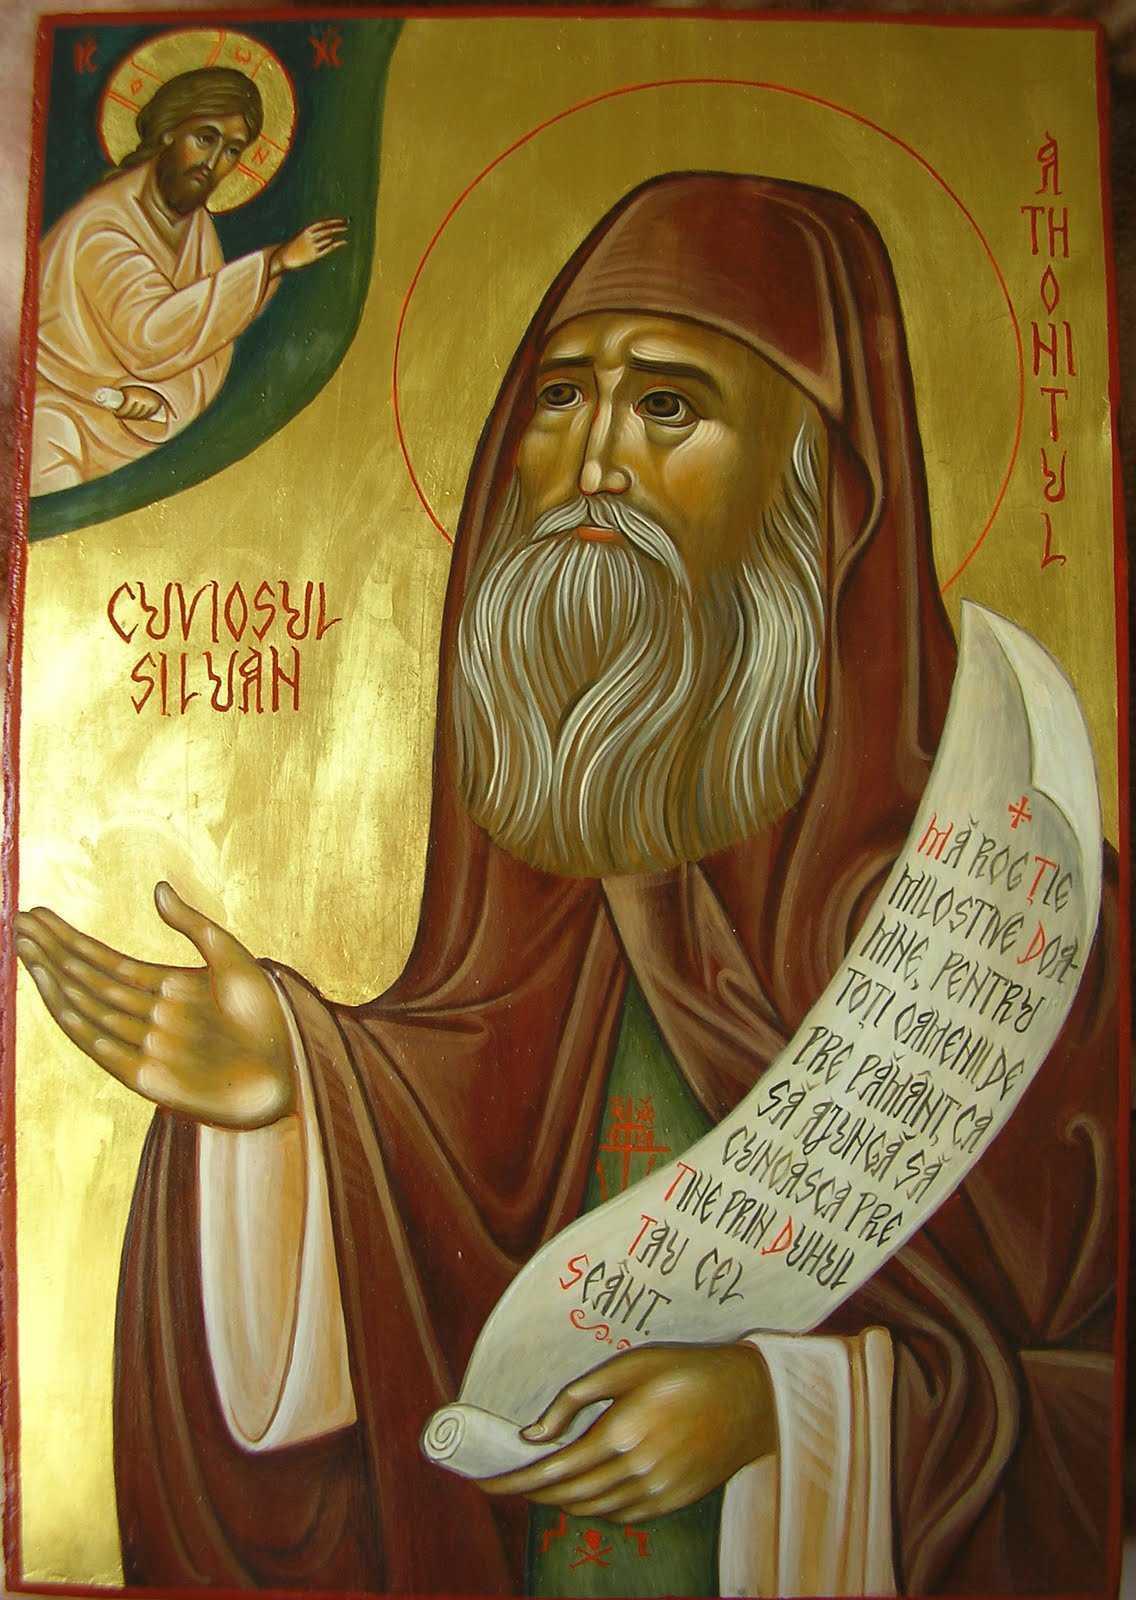 SFANTUL SILUAN ATHONITUL &#8211; cantari si cuvinte duhovnicesti: <i>&#8220;Fara har, sufletul e asemenea unui dobitoc&#8221;</i>. CAND NE ASCULTA DUMNEZEU RUGACIUNILE?